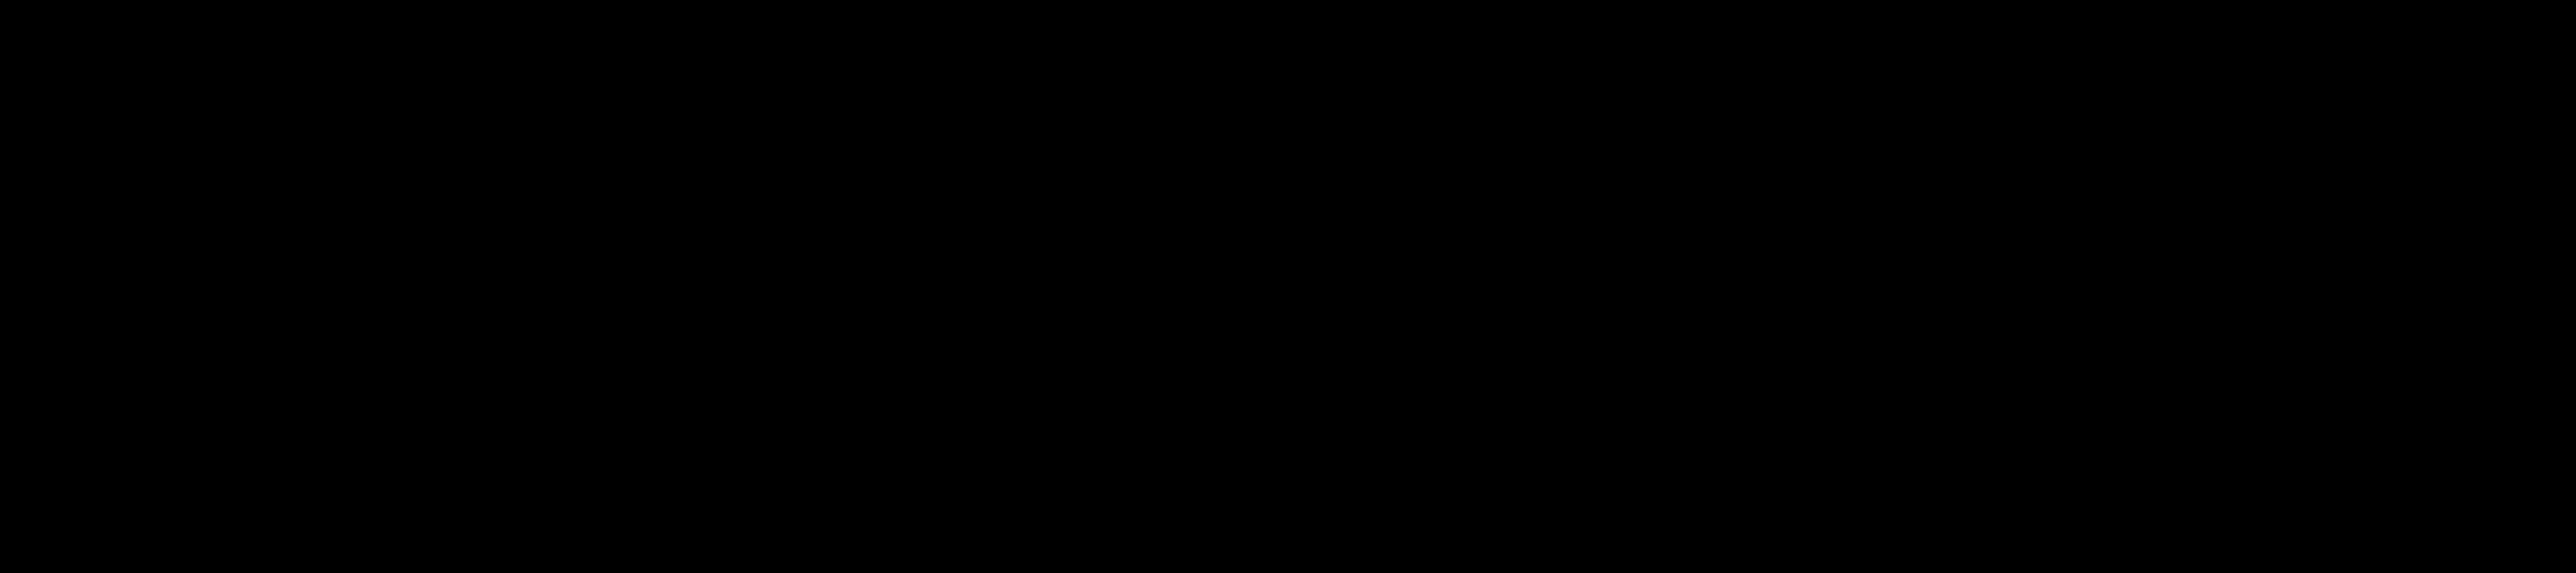 Производитель Zyxel